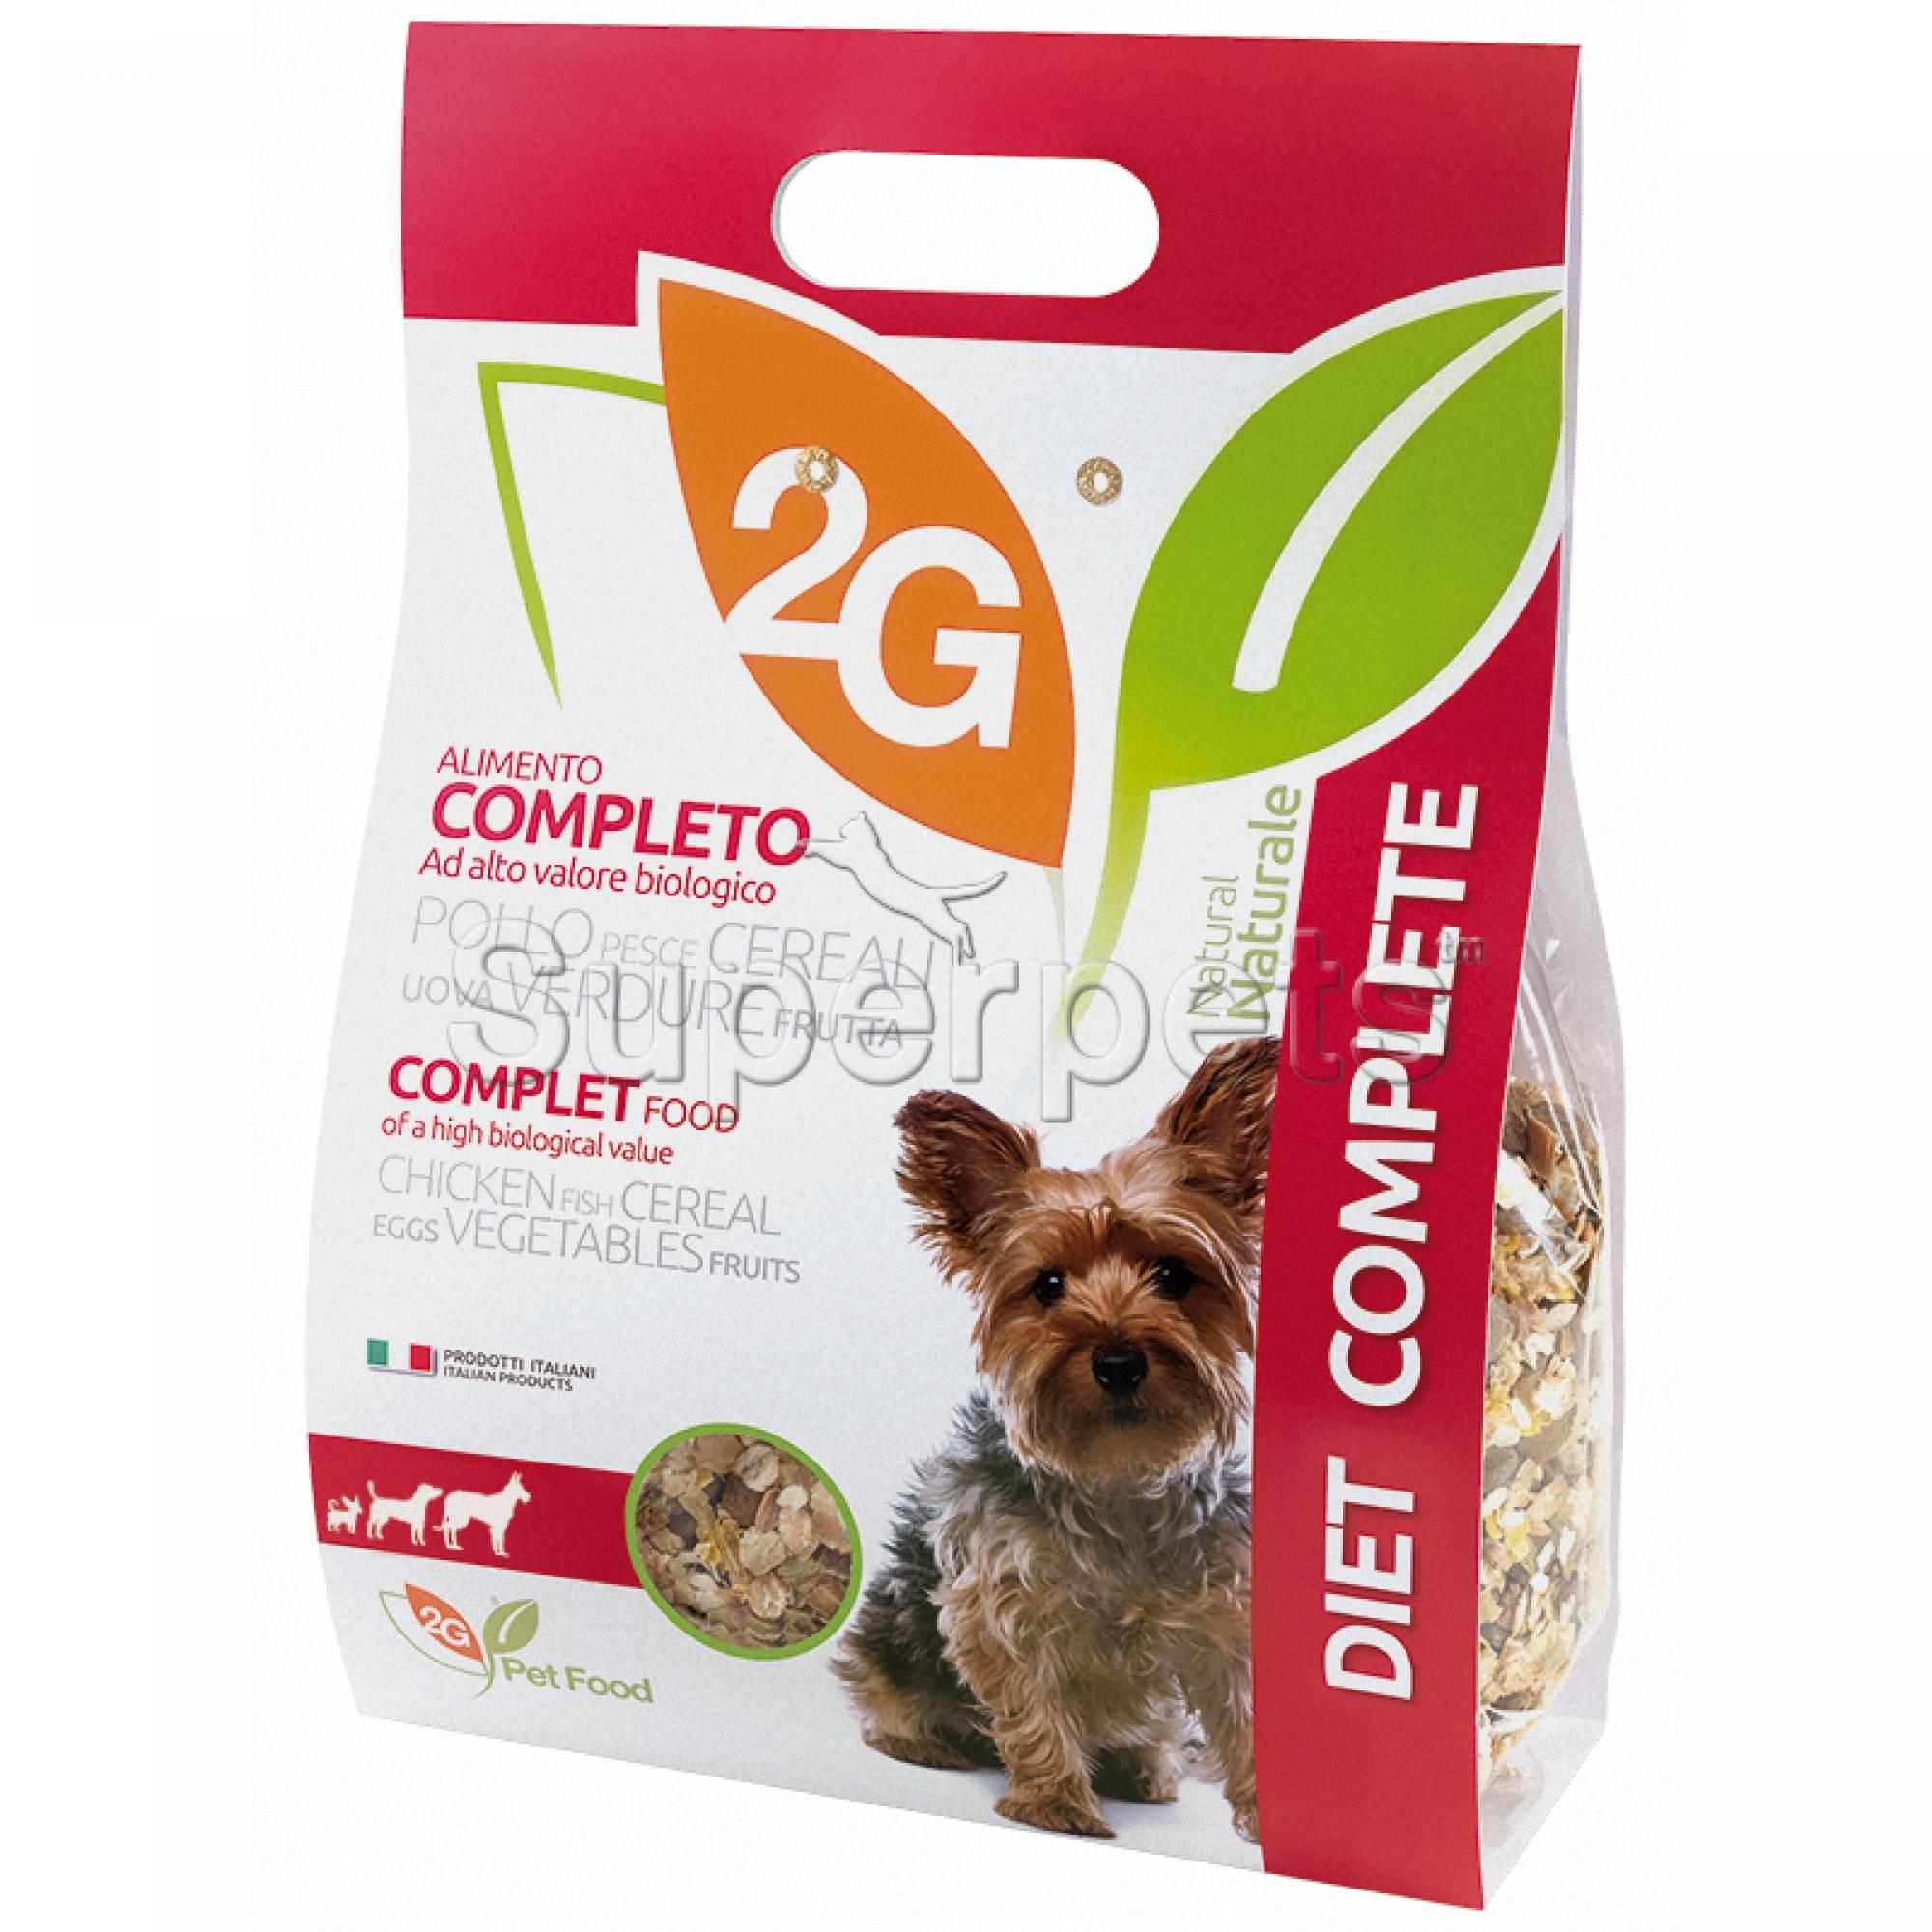 2G Pet Food - Diet Complete 2kg